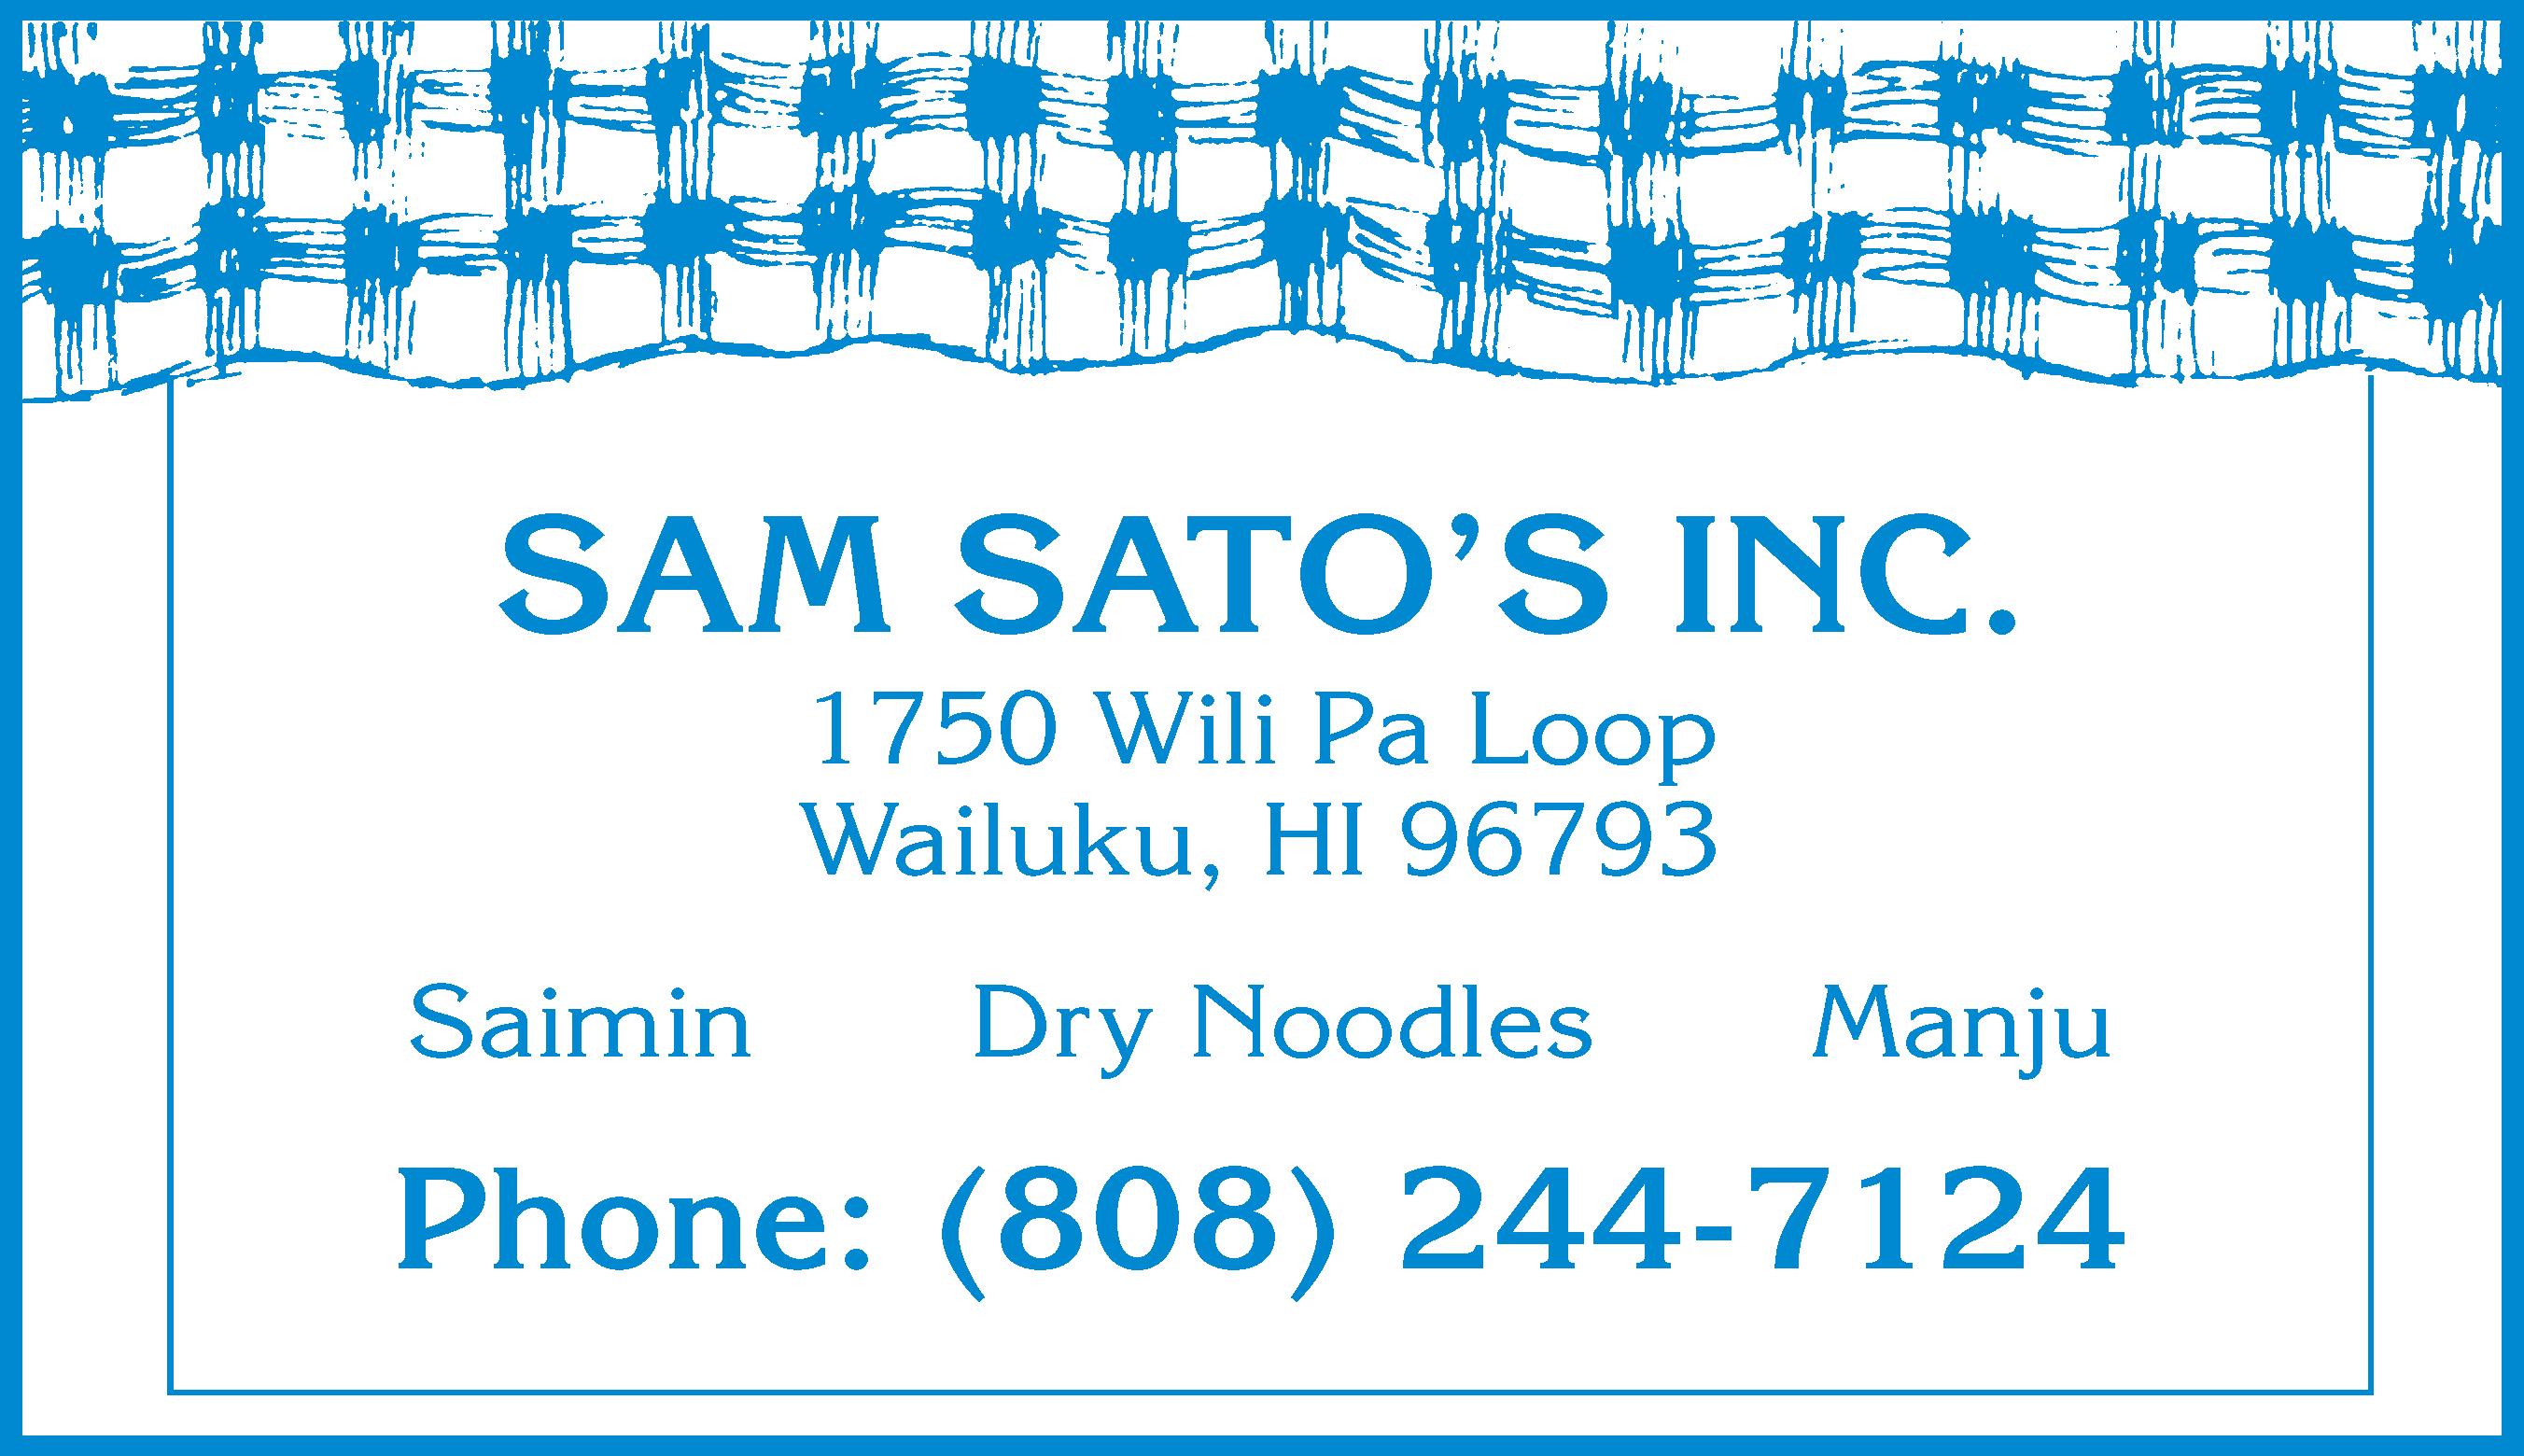 Sam Sato's Inc, saimin dry noodles, manju